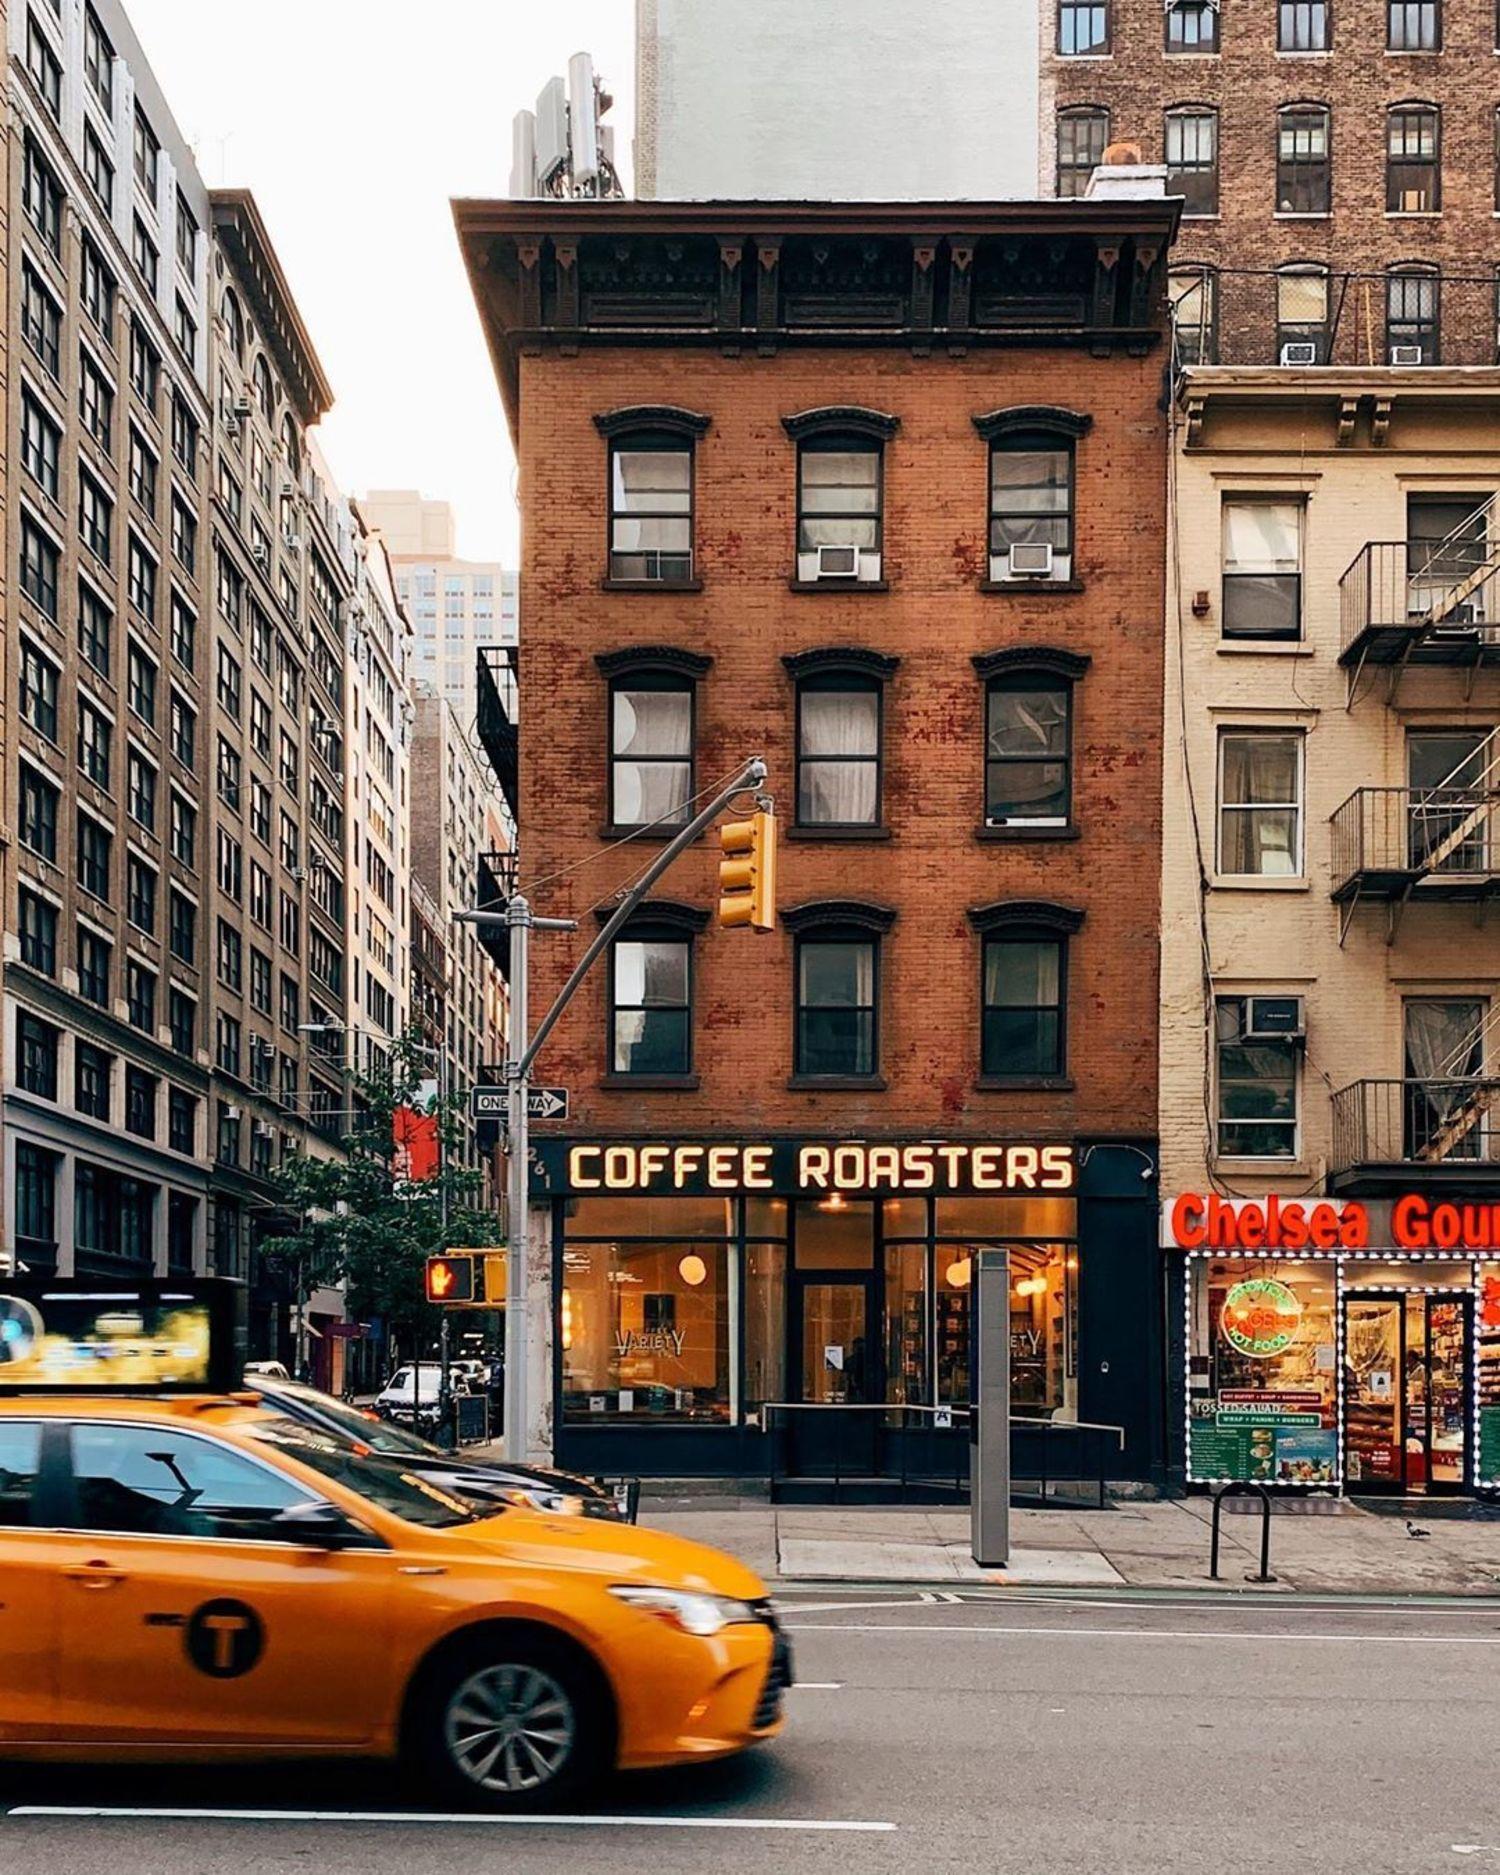 7th Avenue and 25th Street, Chelsea, Manhattan